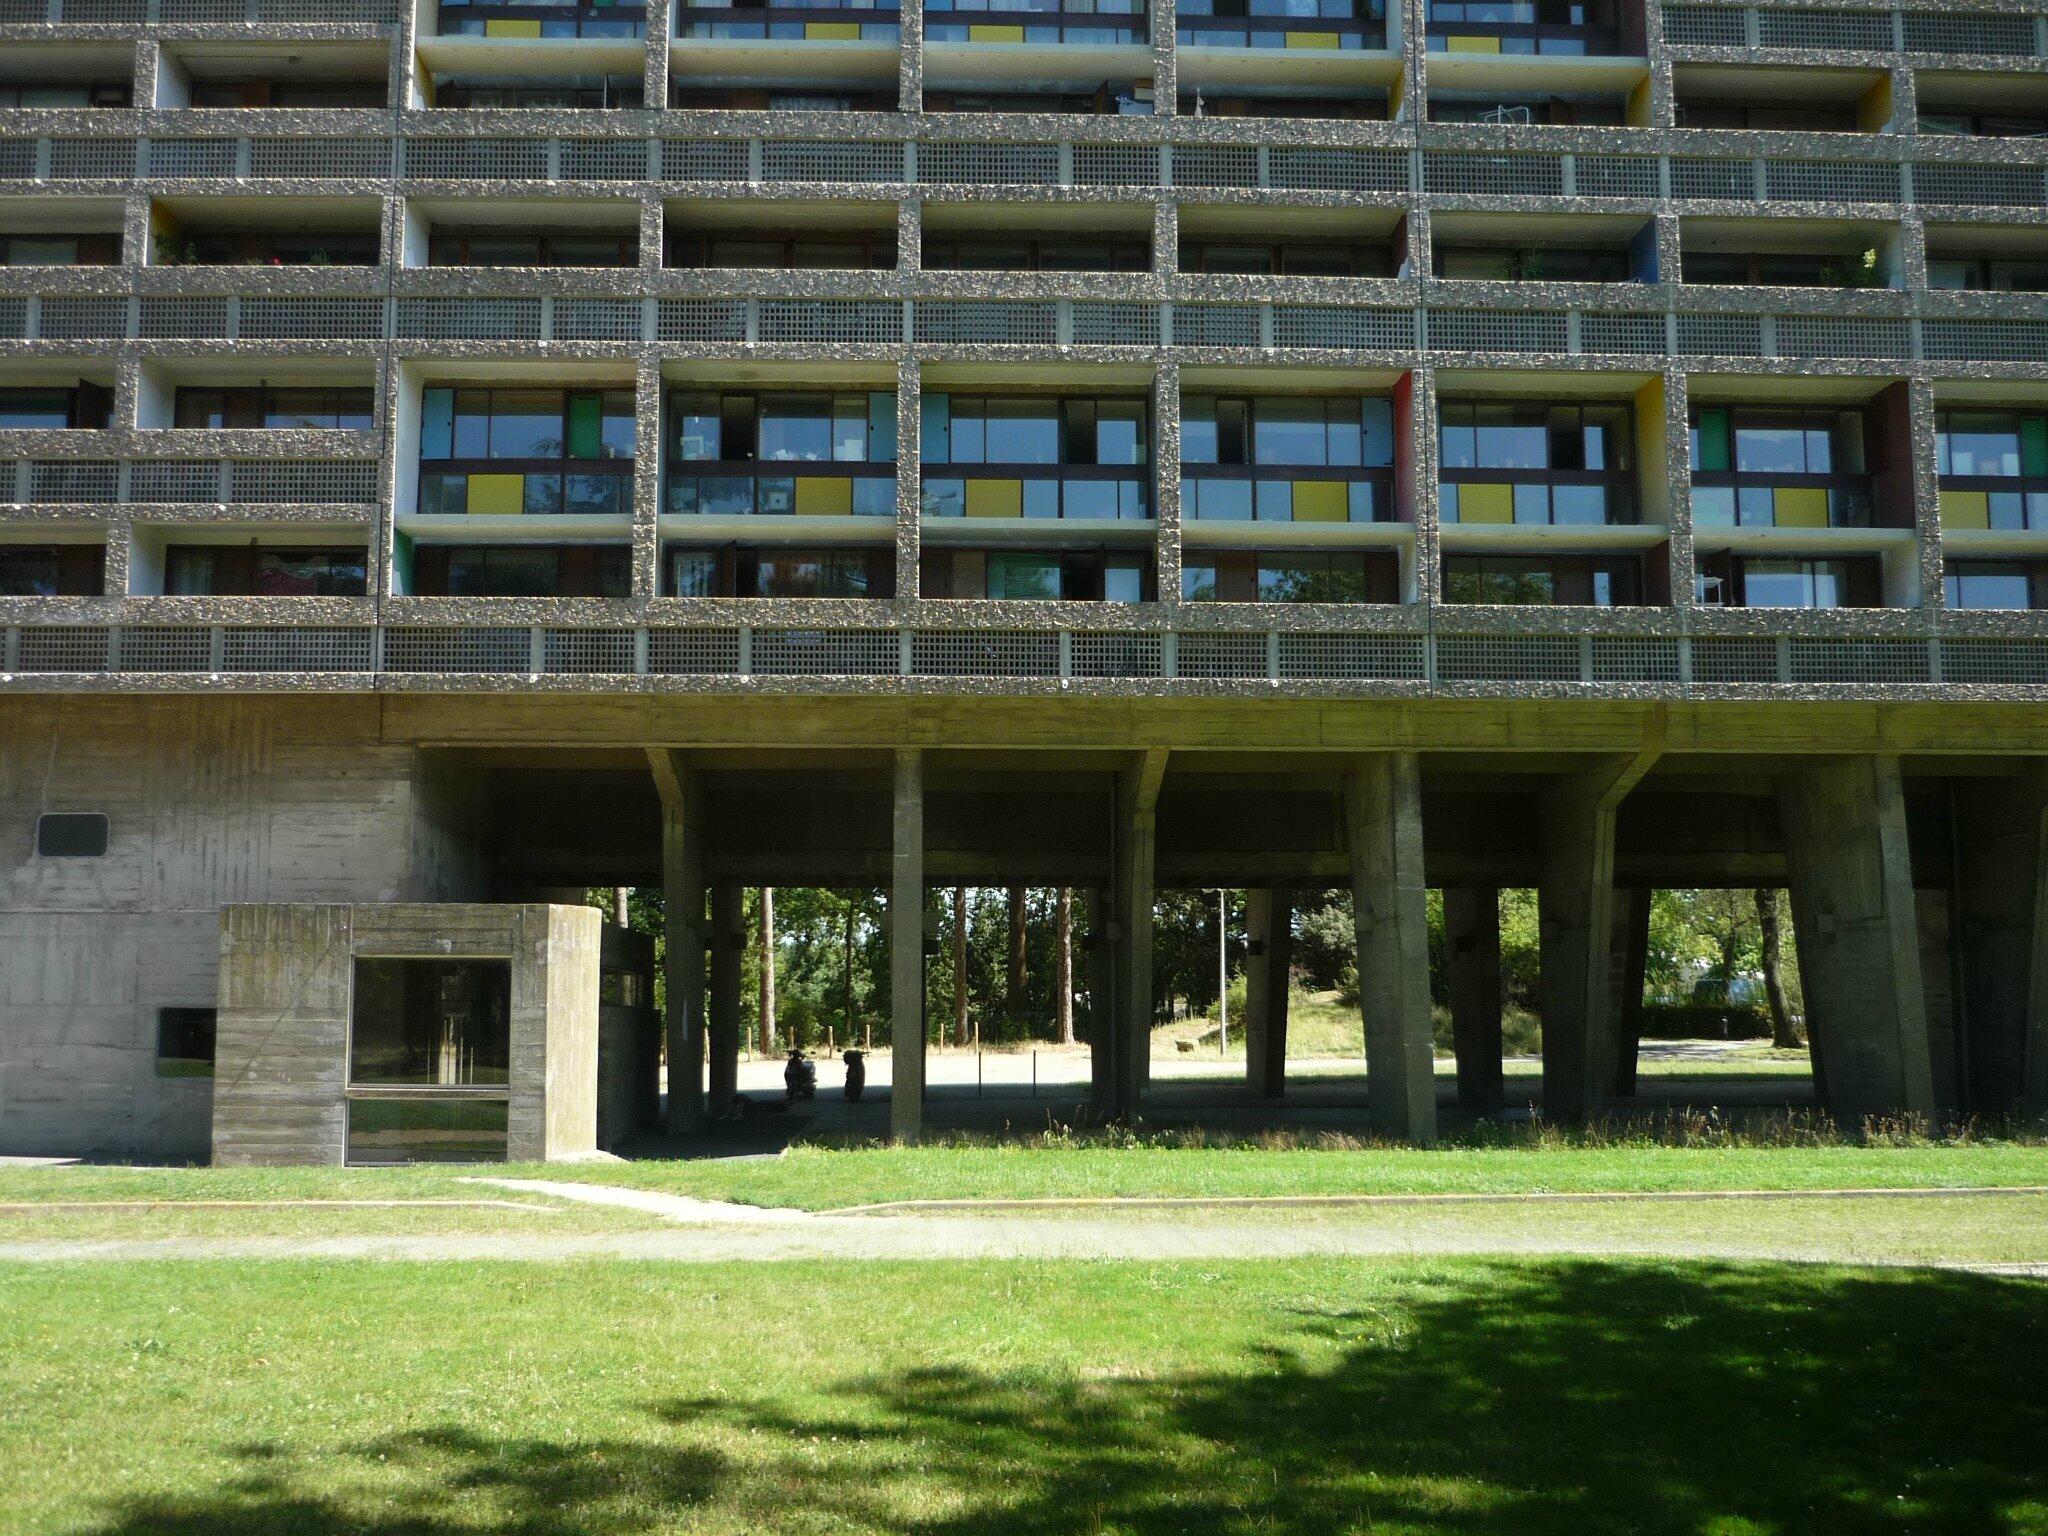 Le corbusier nantes po47 jornalagora for Type d habitation en france